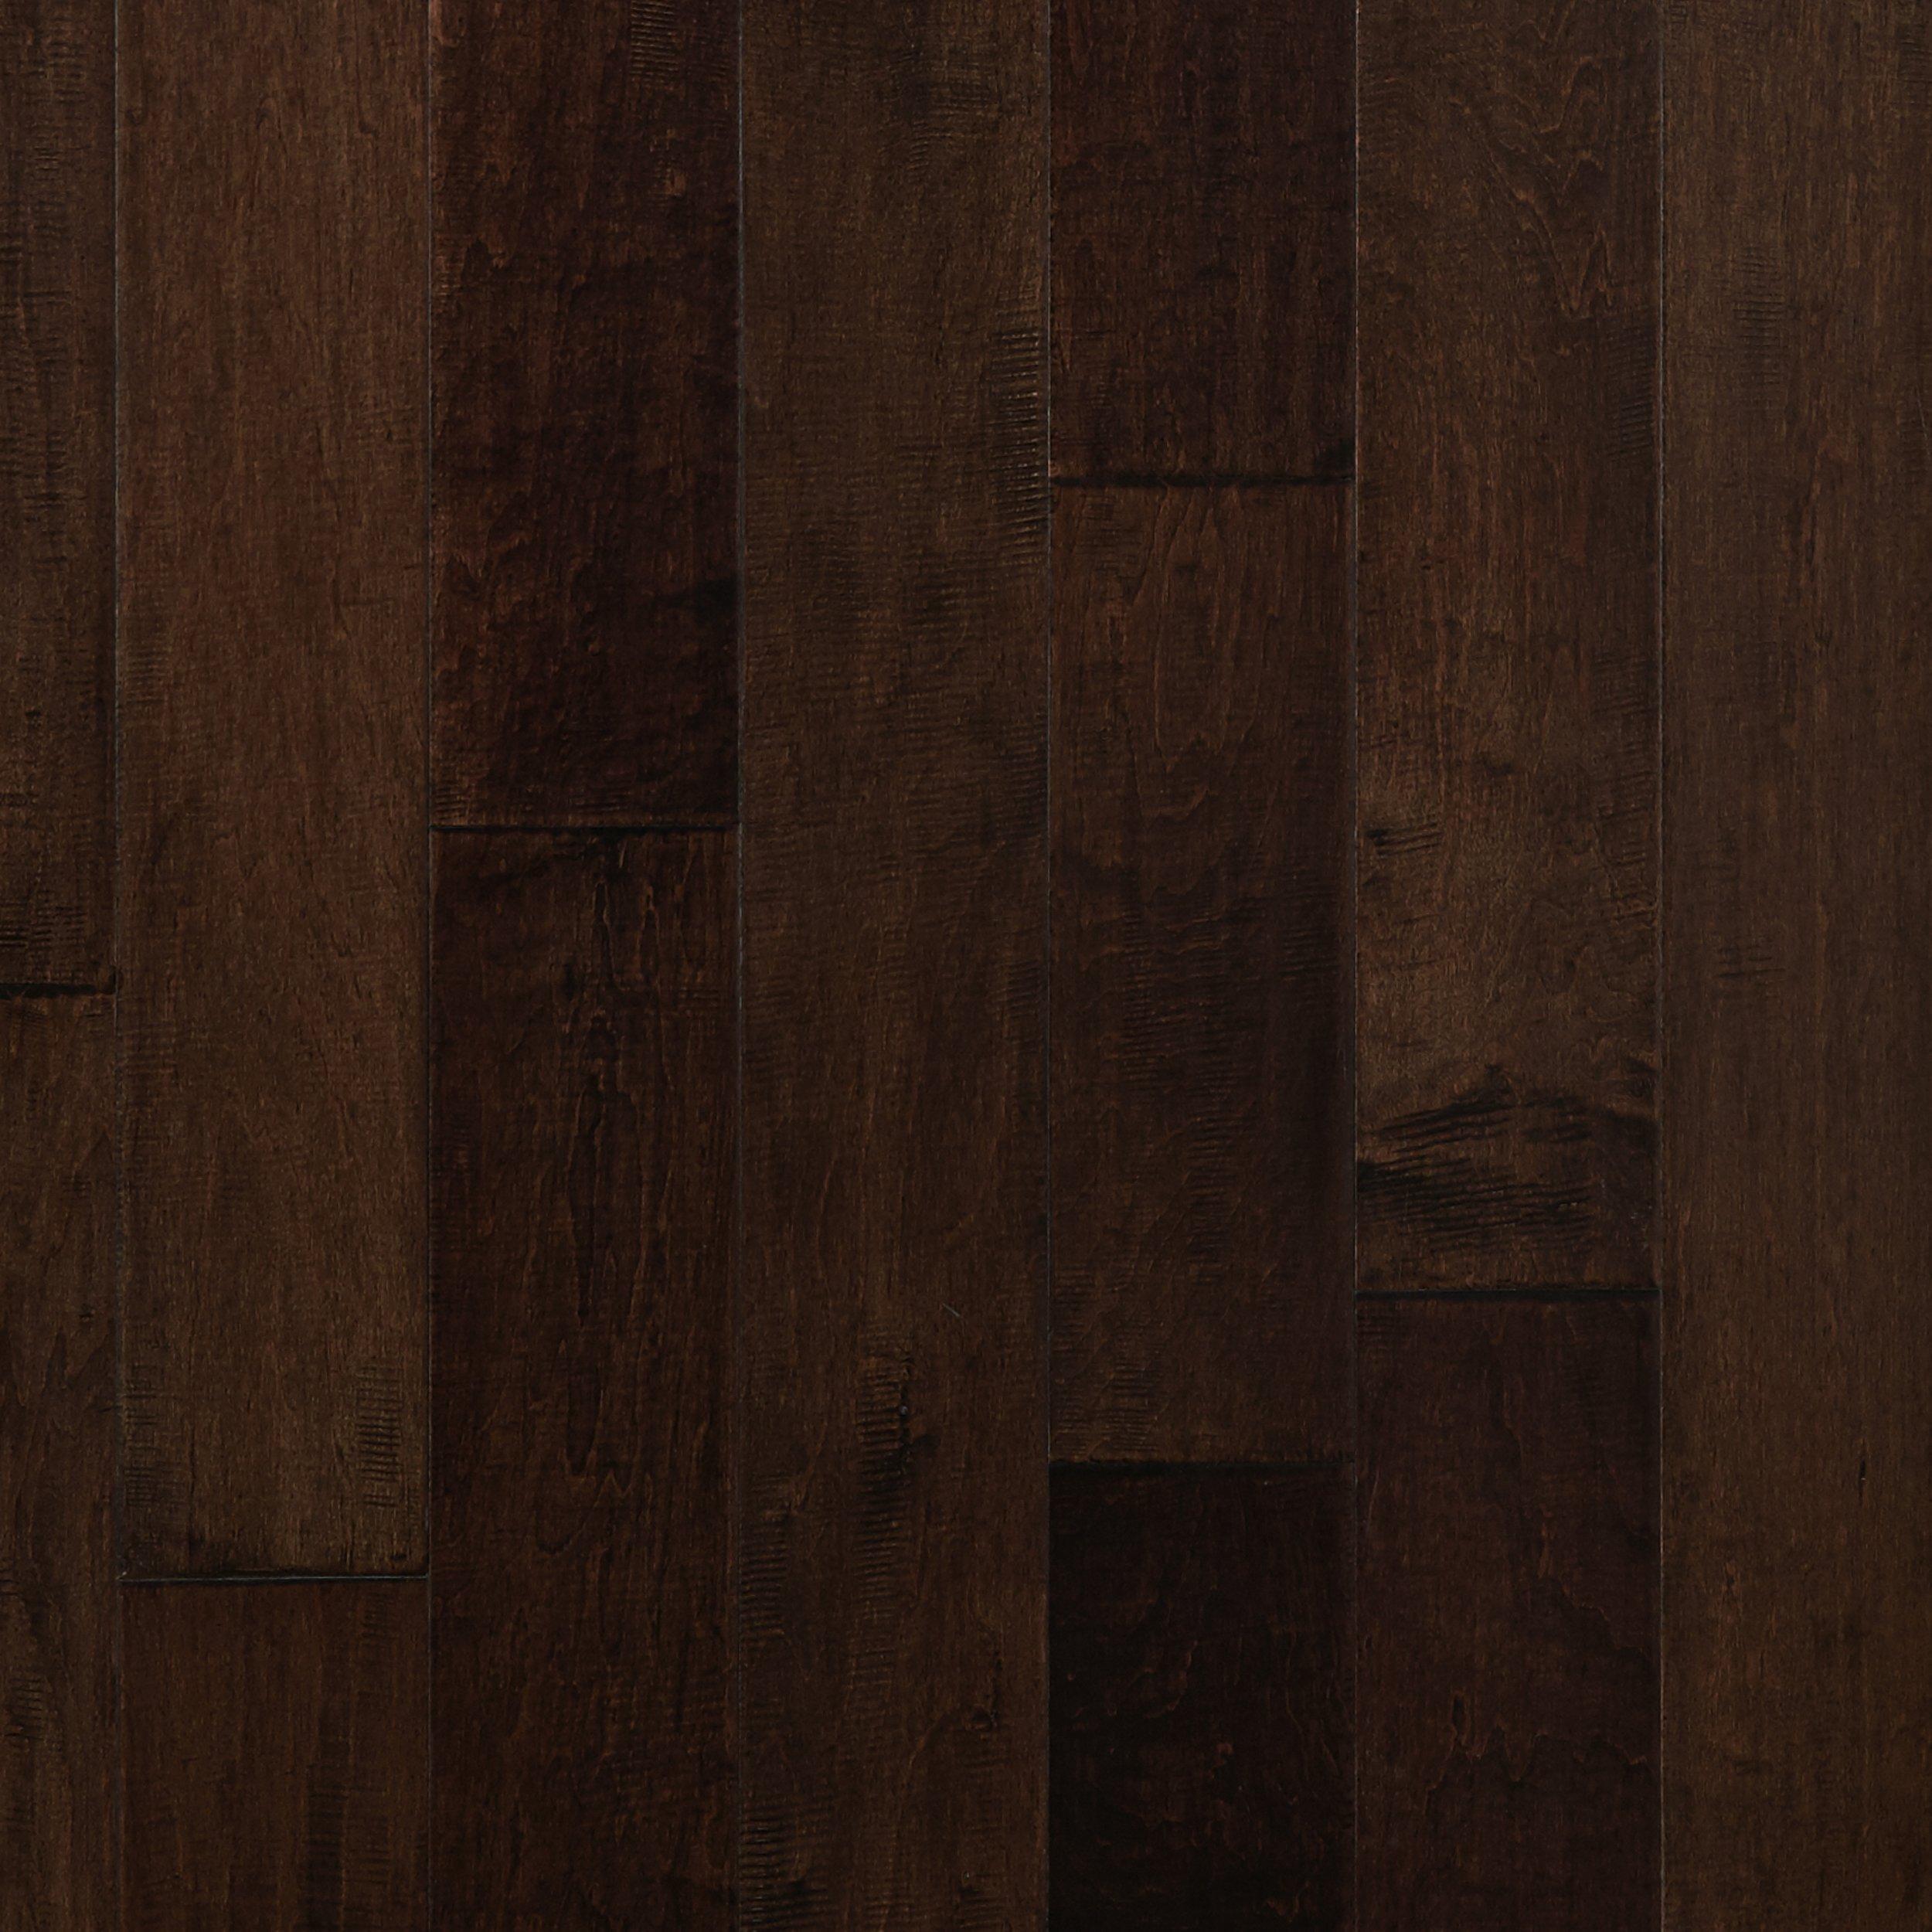 Cocoa Brown Maple Hand Scraped Engineered Hardwood   3/8in. X 5in.    100076405   Floor And Decor